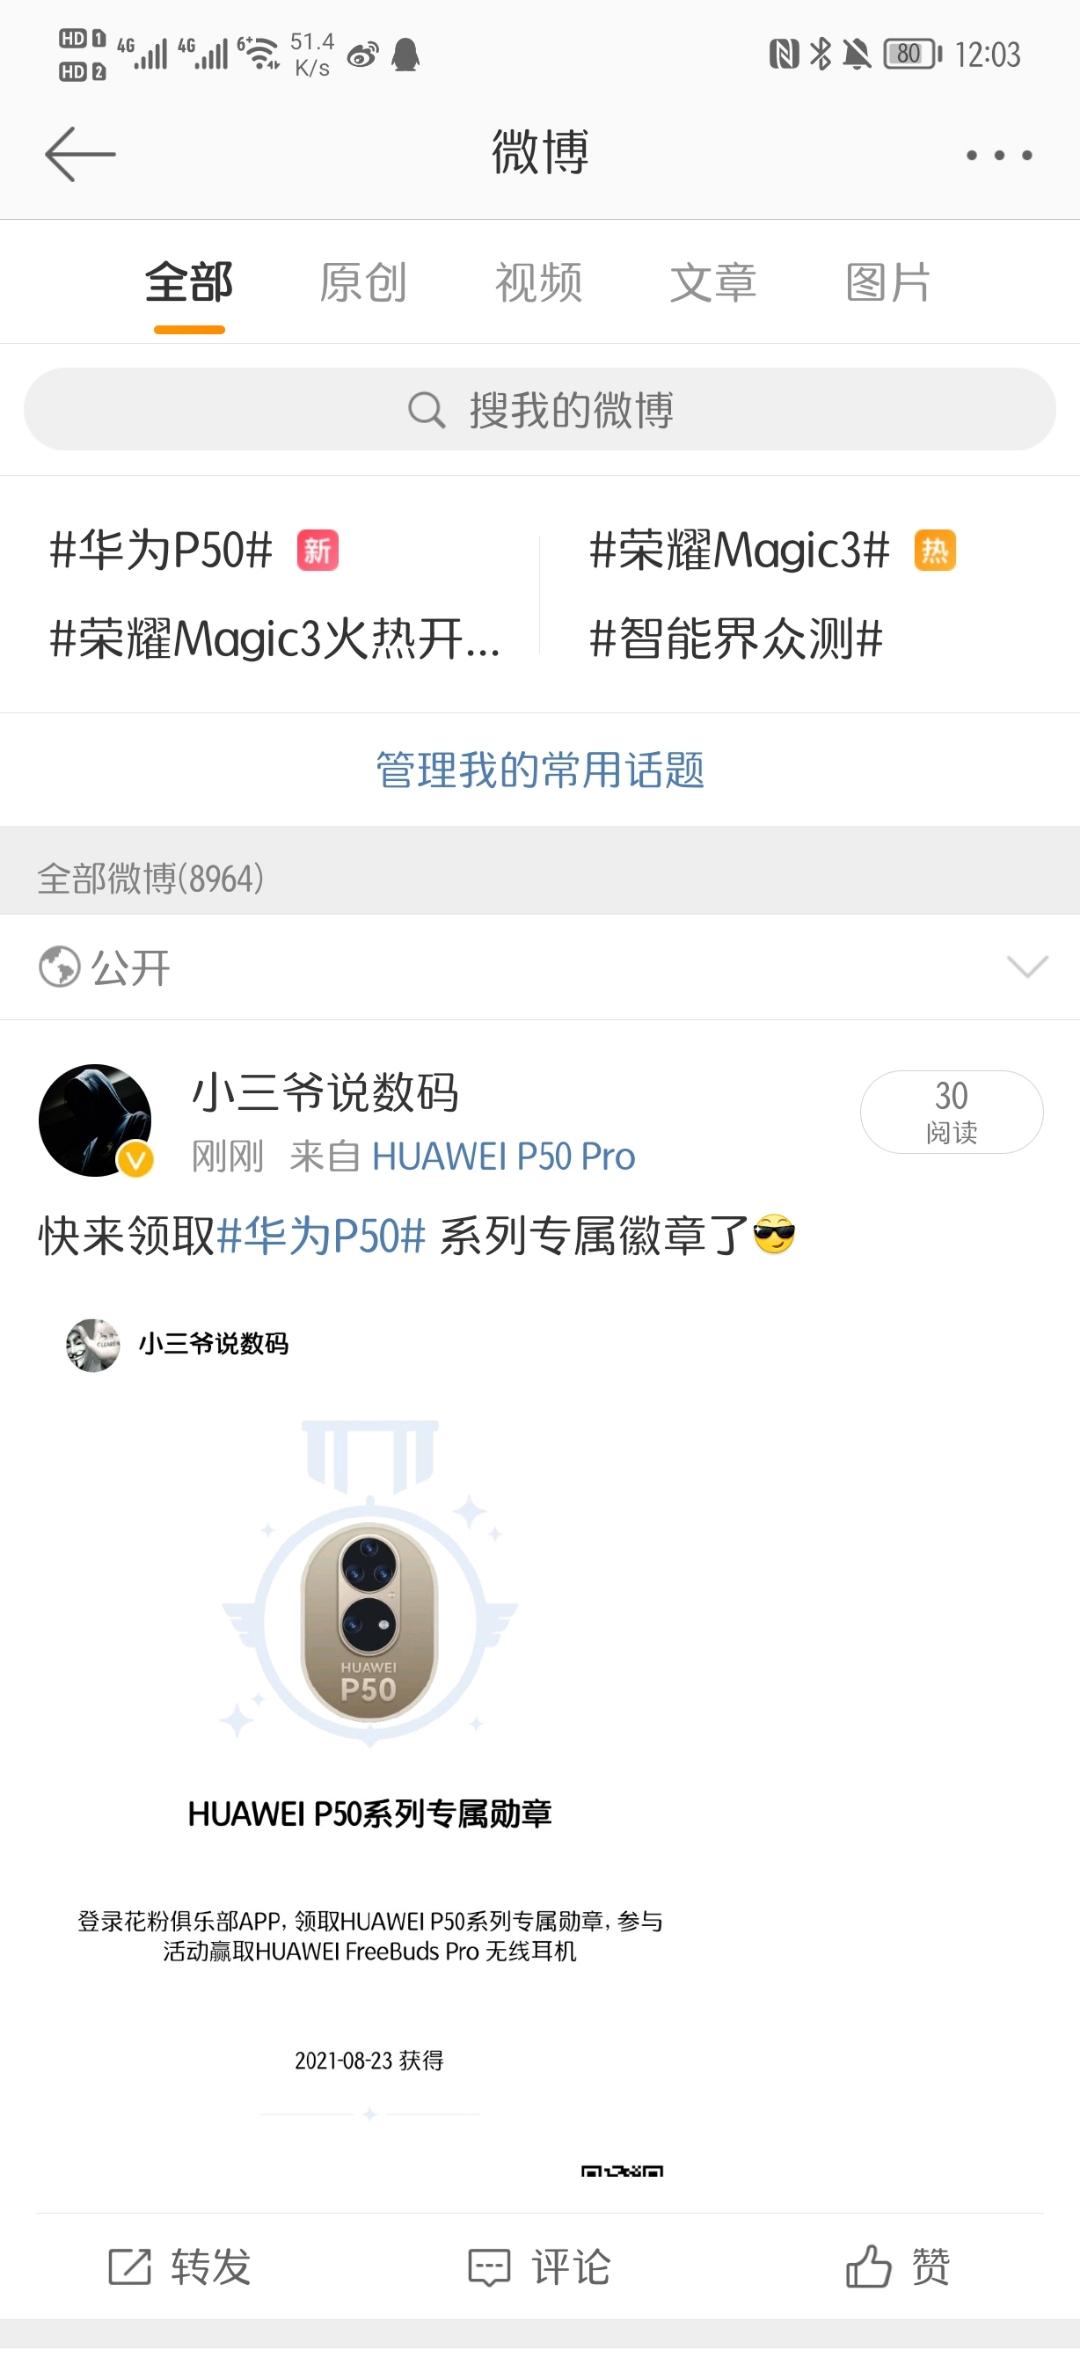 Screenshot_20210823_120334_com.sina.weibo.jpg